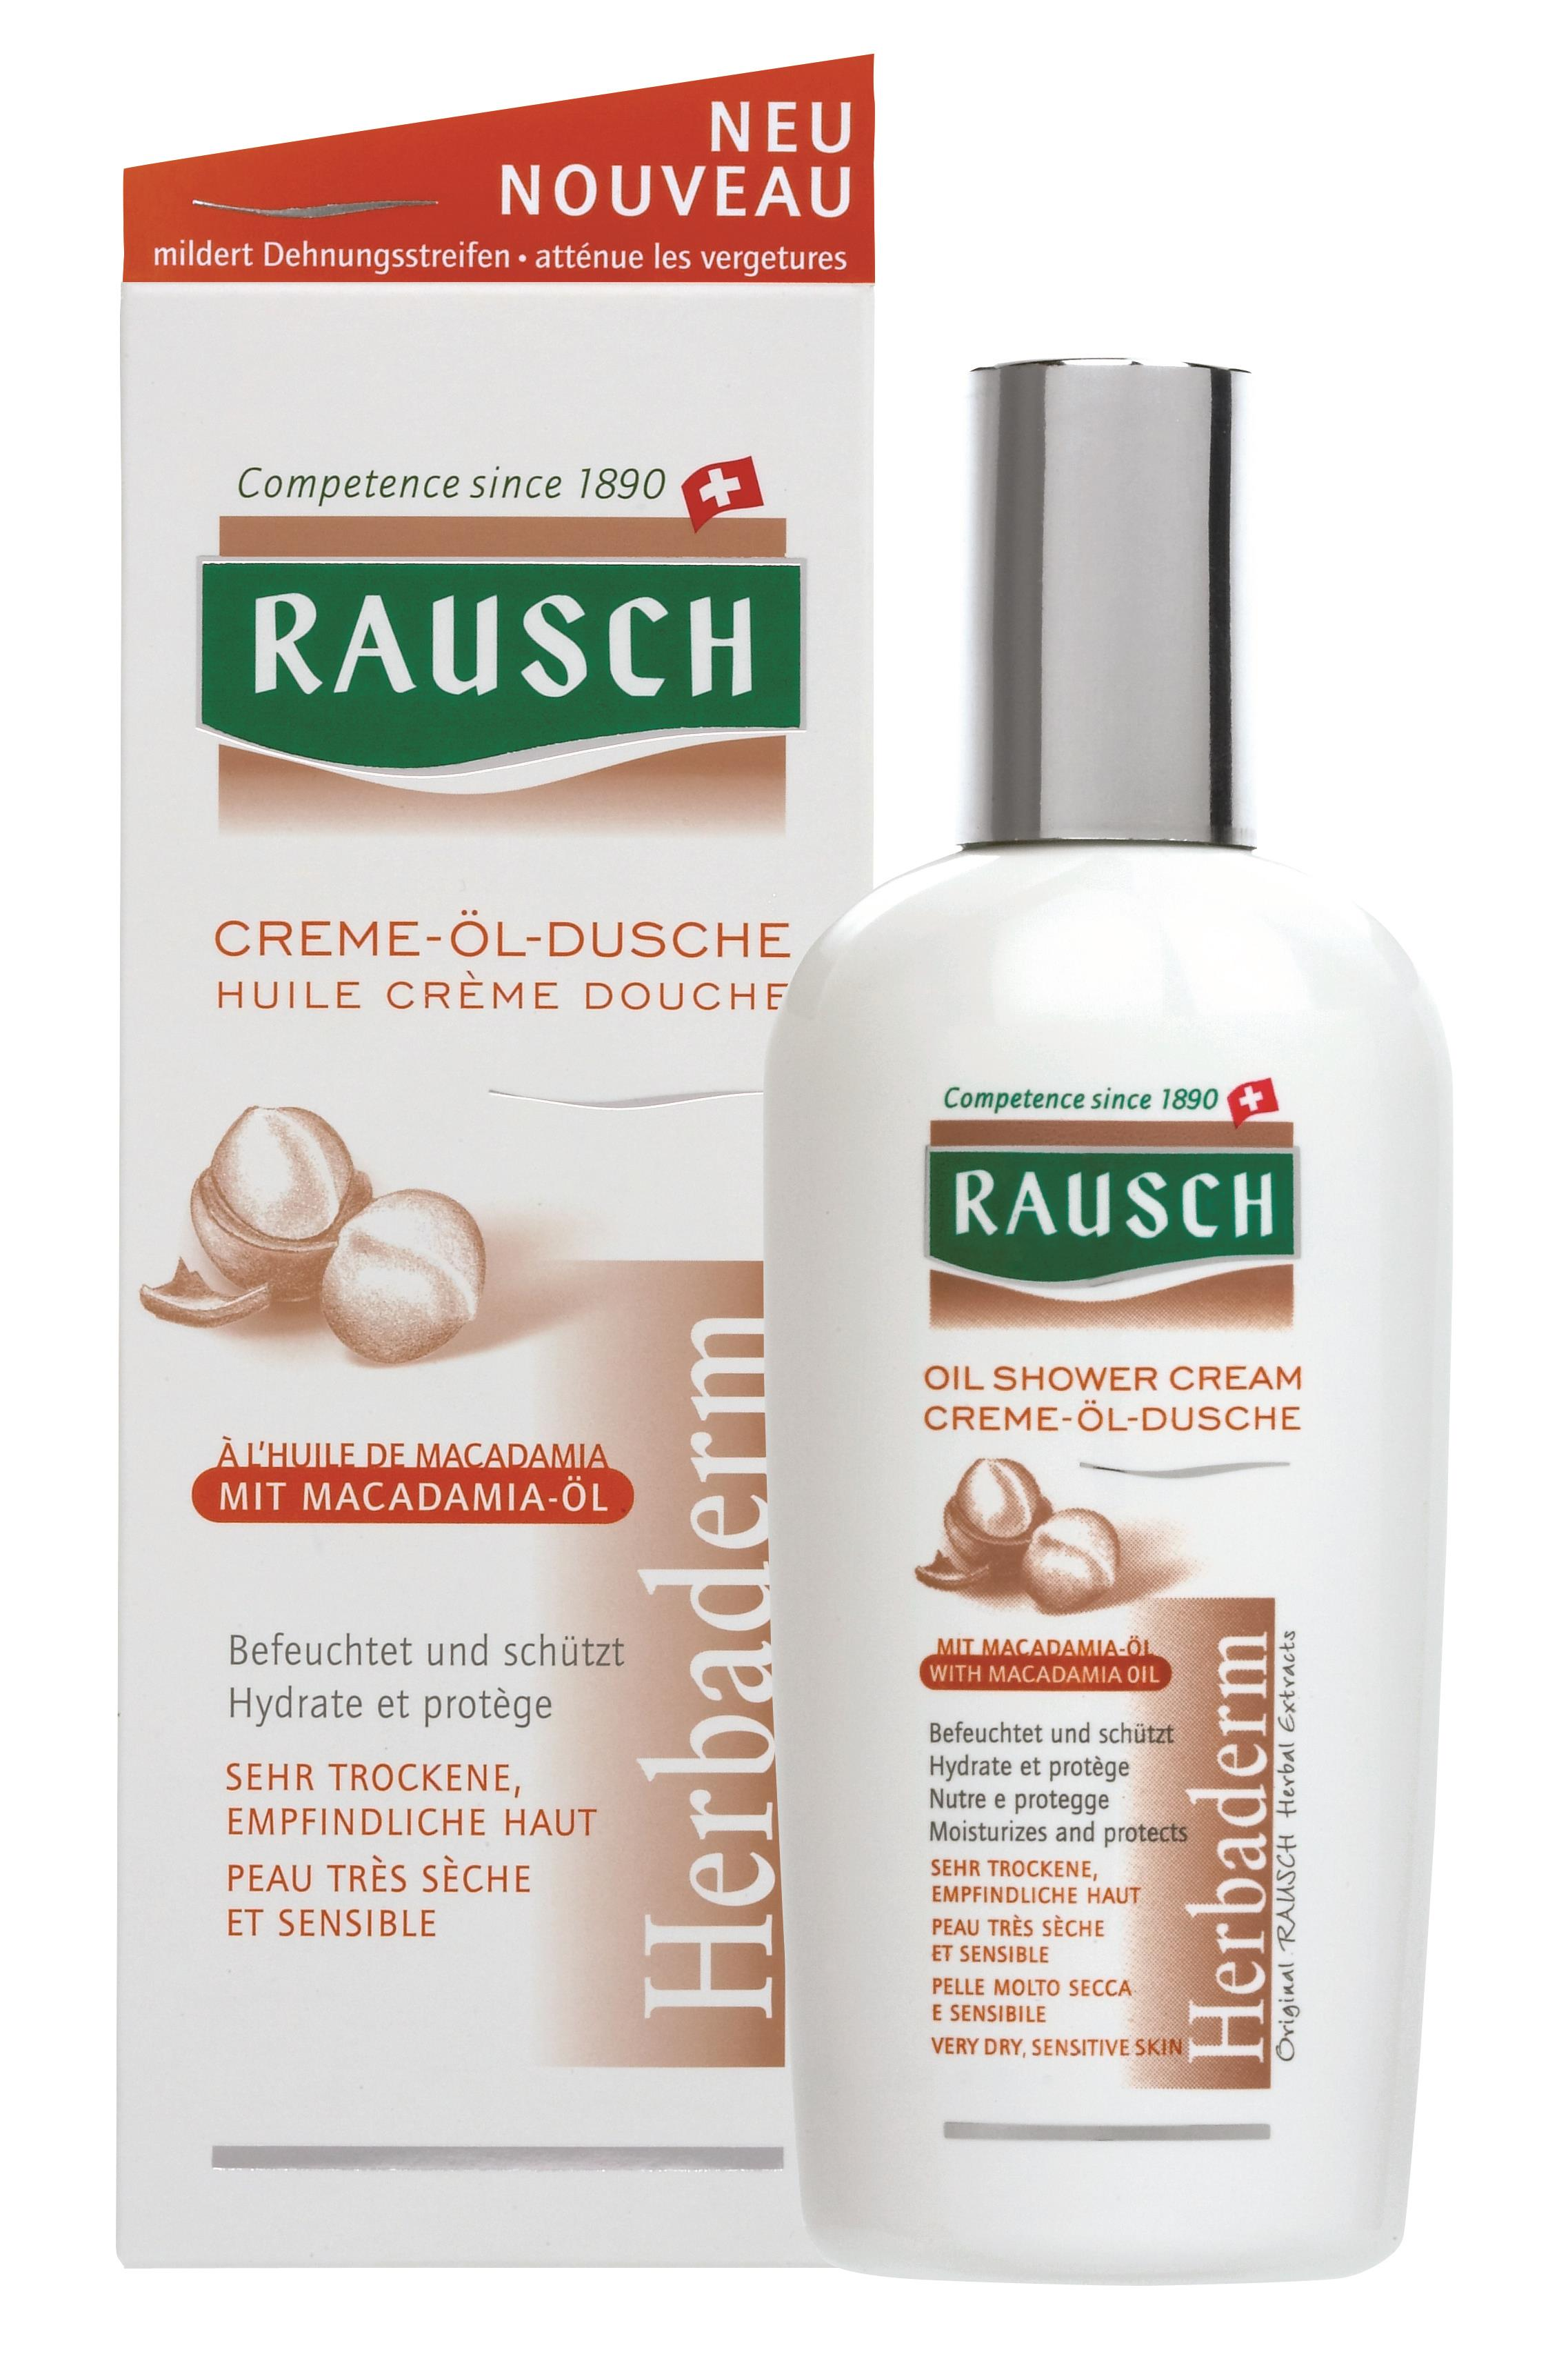 Rausch Creme Öl-Dusche